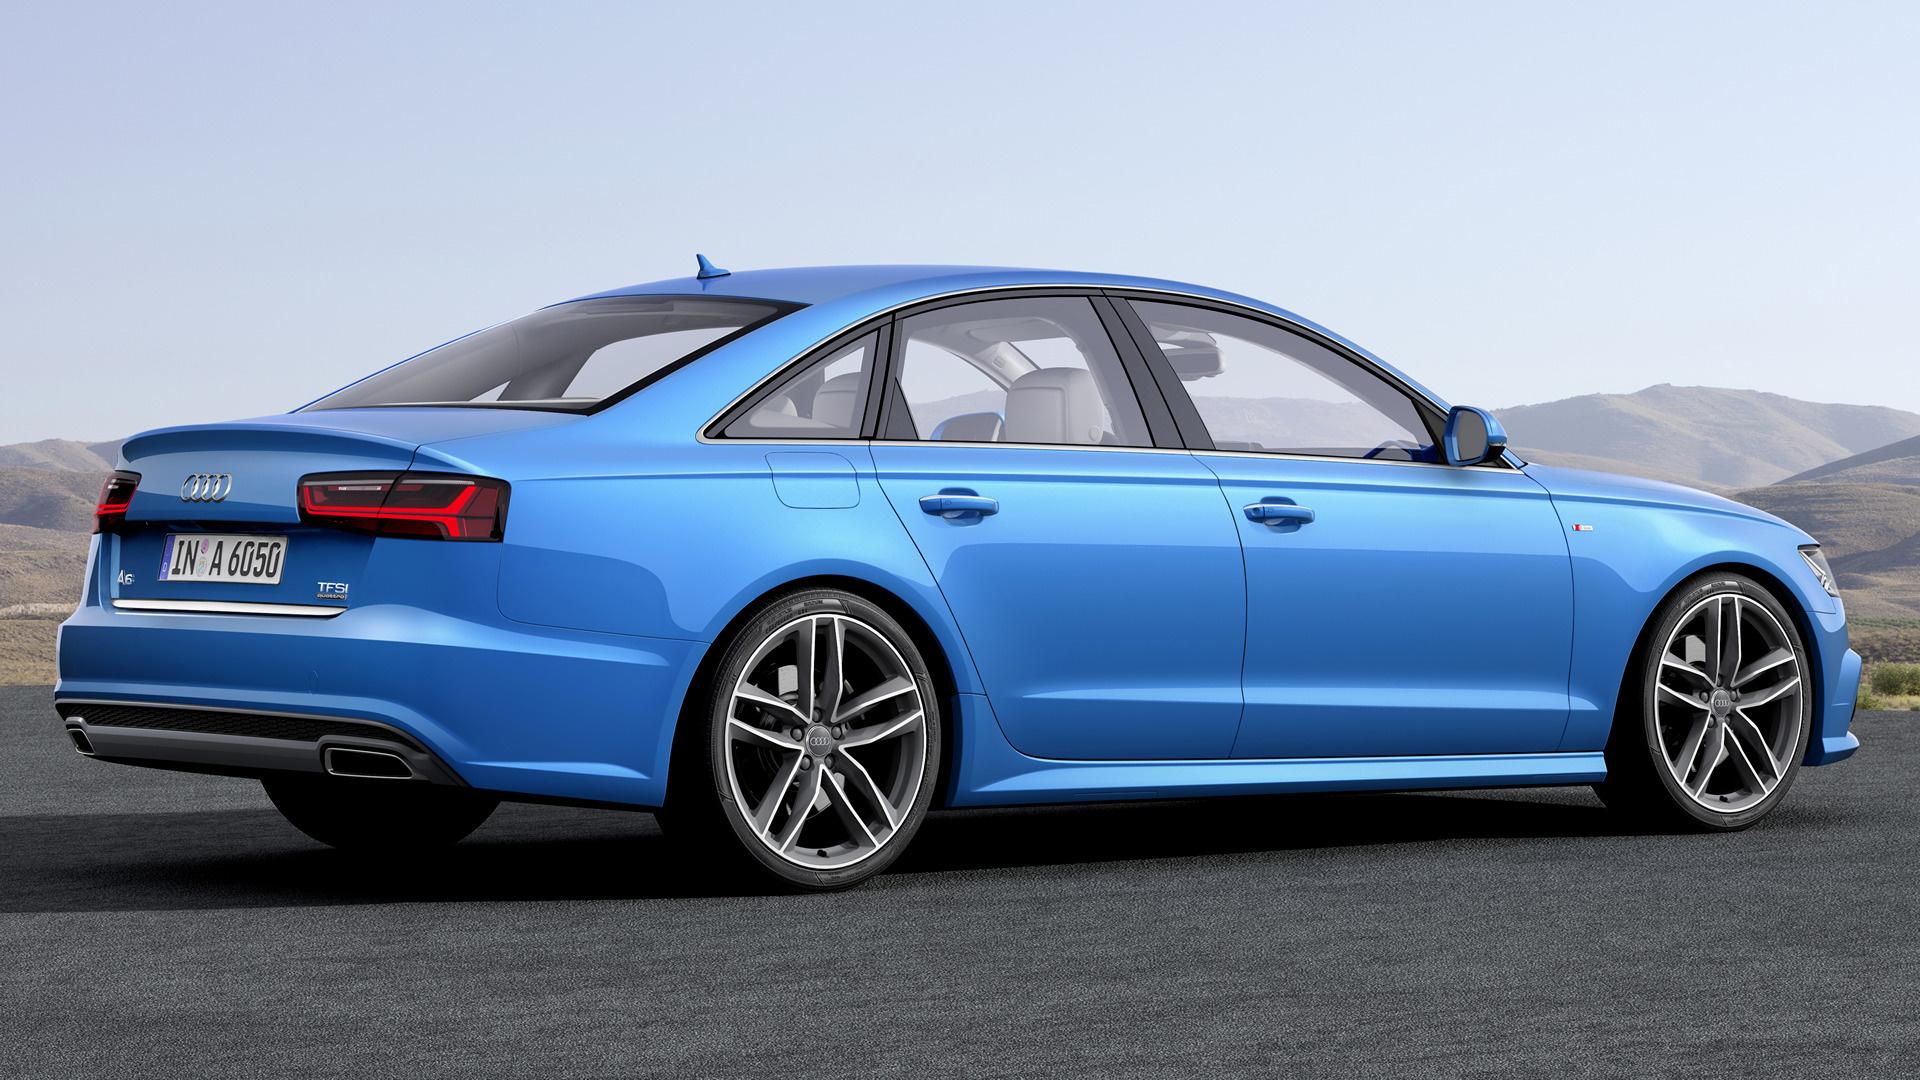 Audi A Sedan S Line Wallpaper Hd on Gmc Sedan